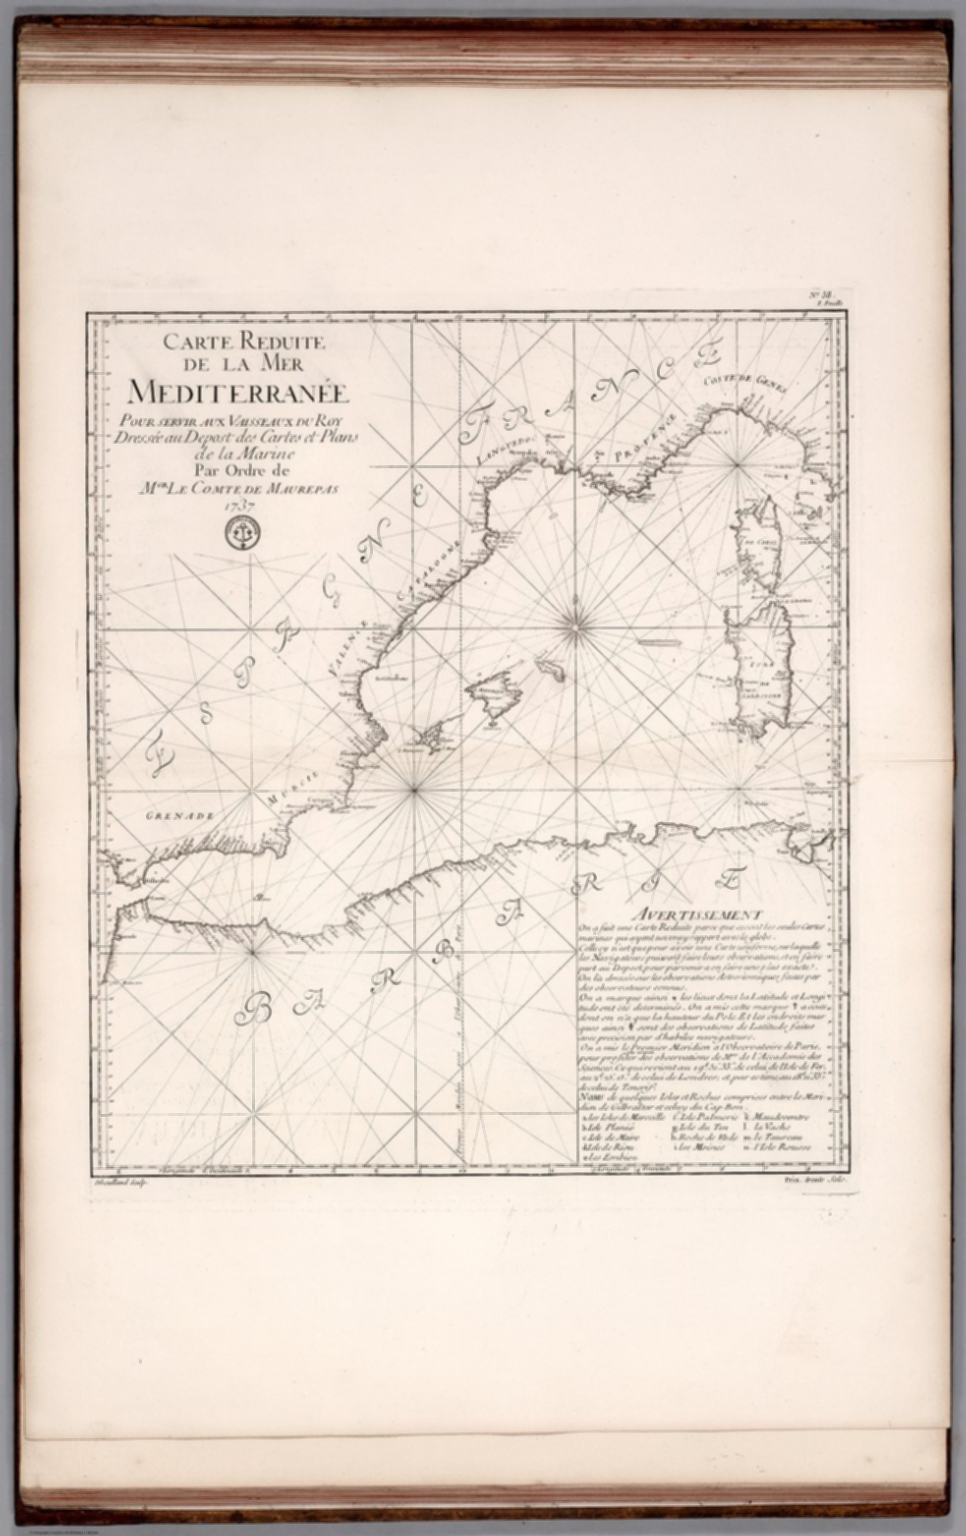 Carte Reduite de la Mer Mediterranee (western sheet).